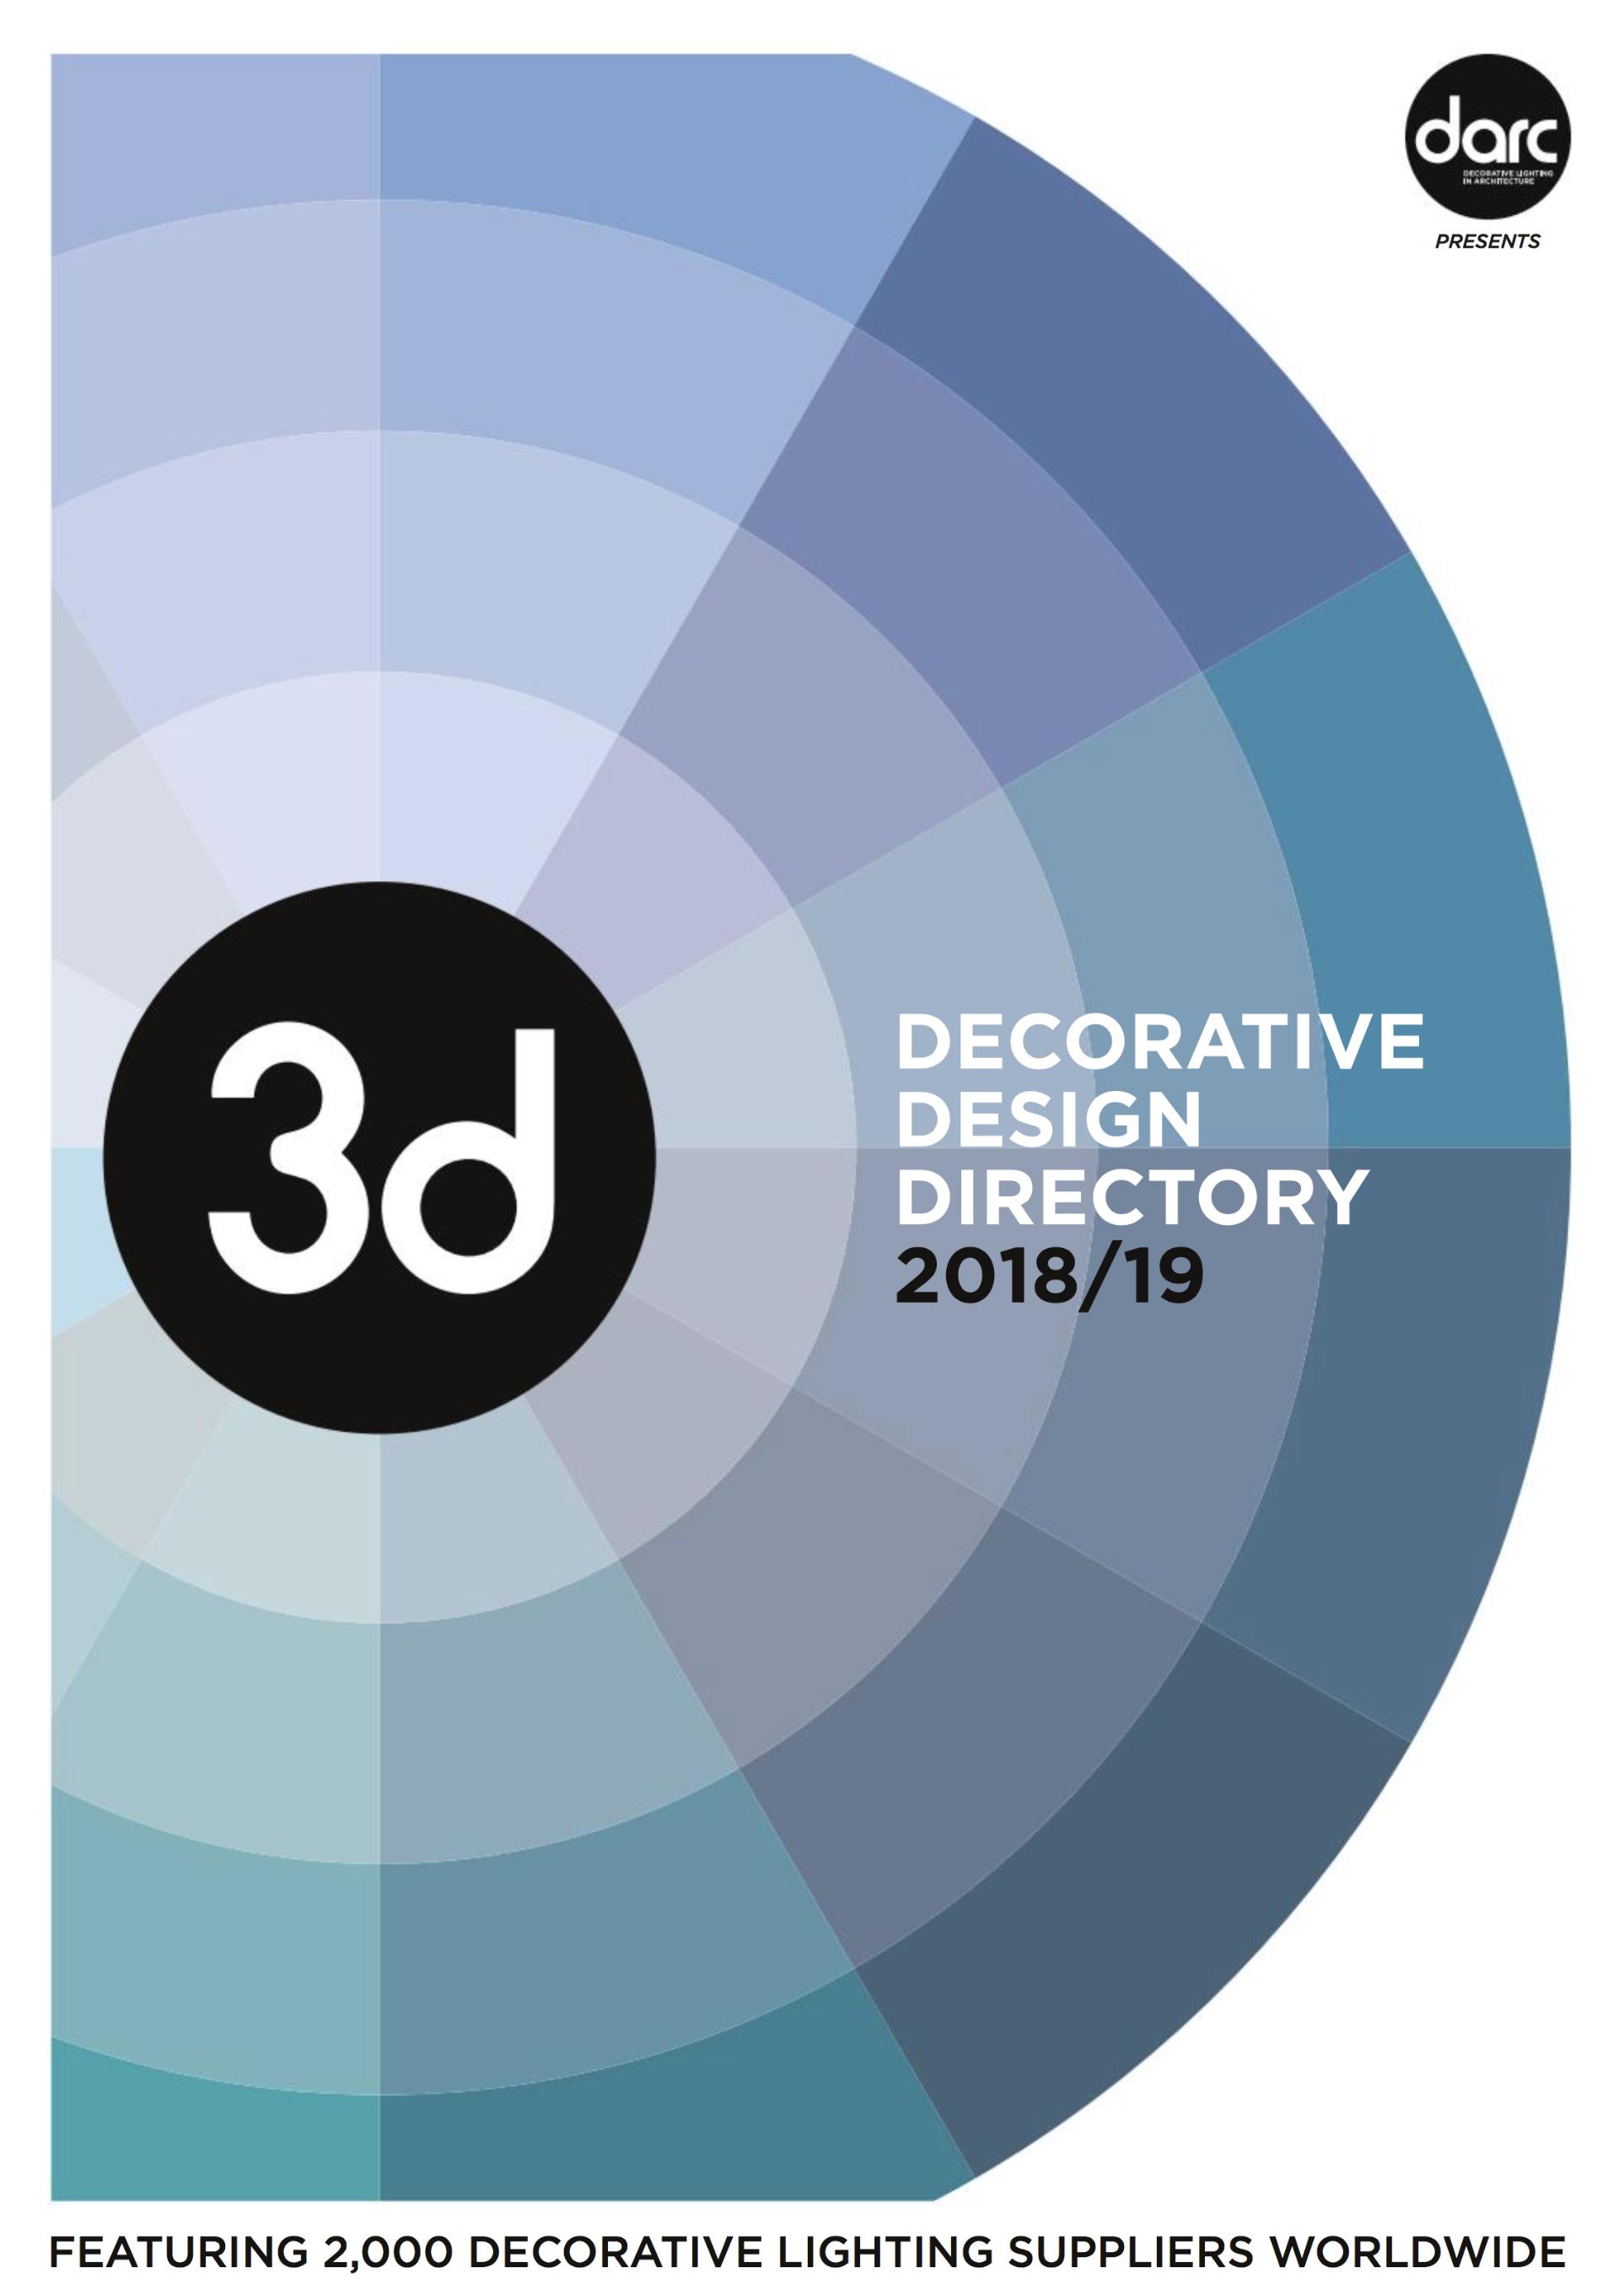 Darc Decorative Design Directory